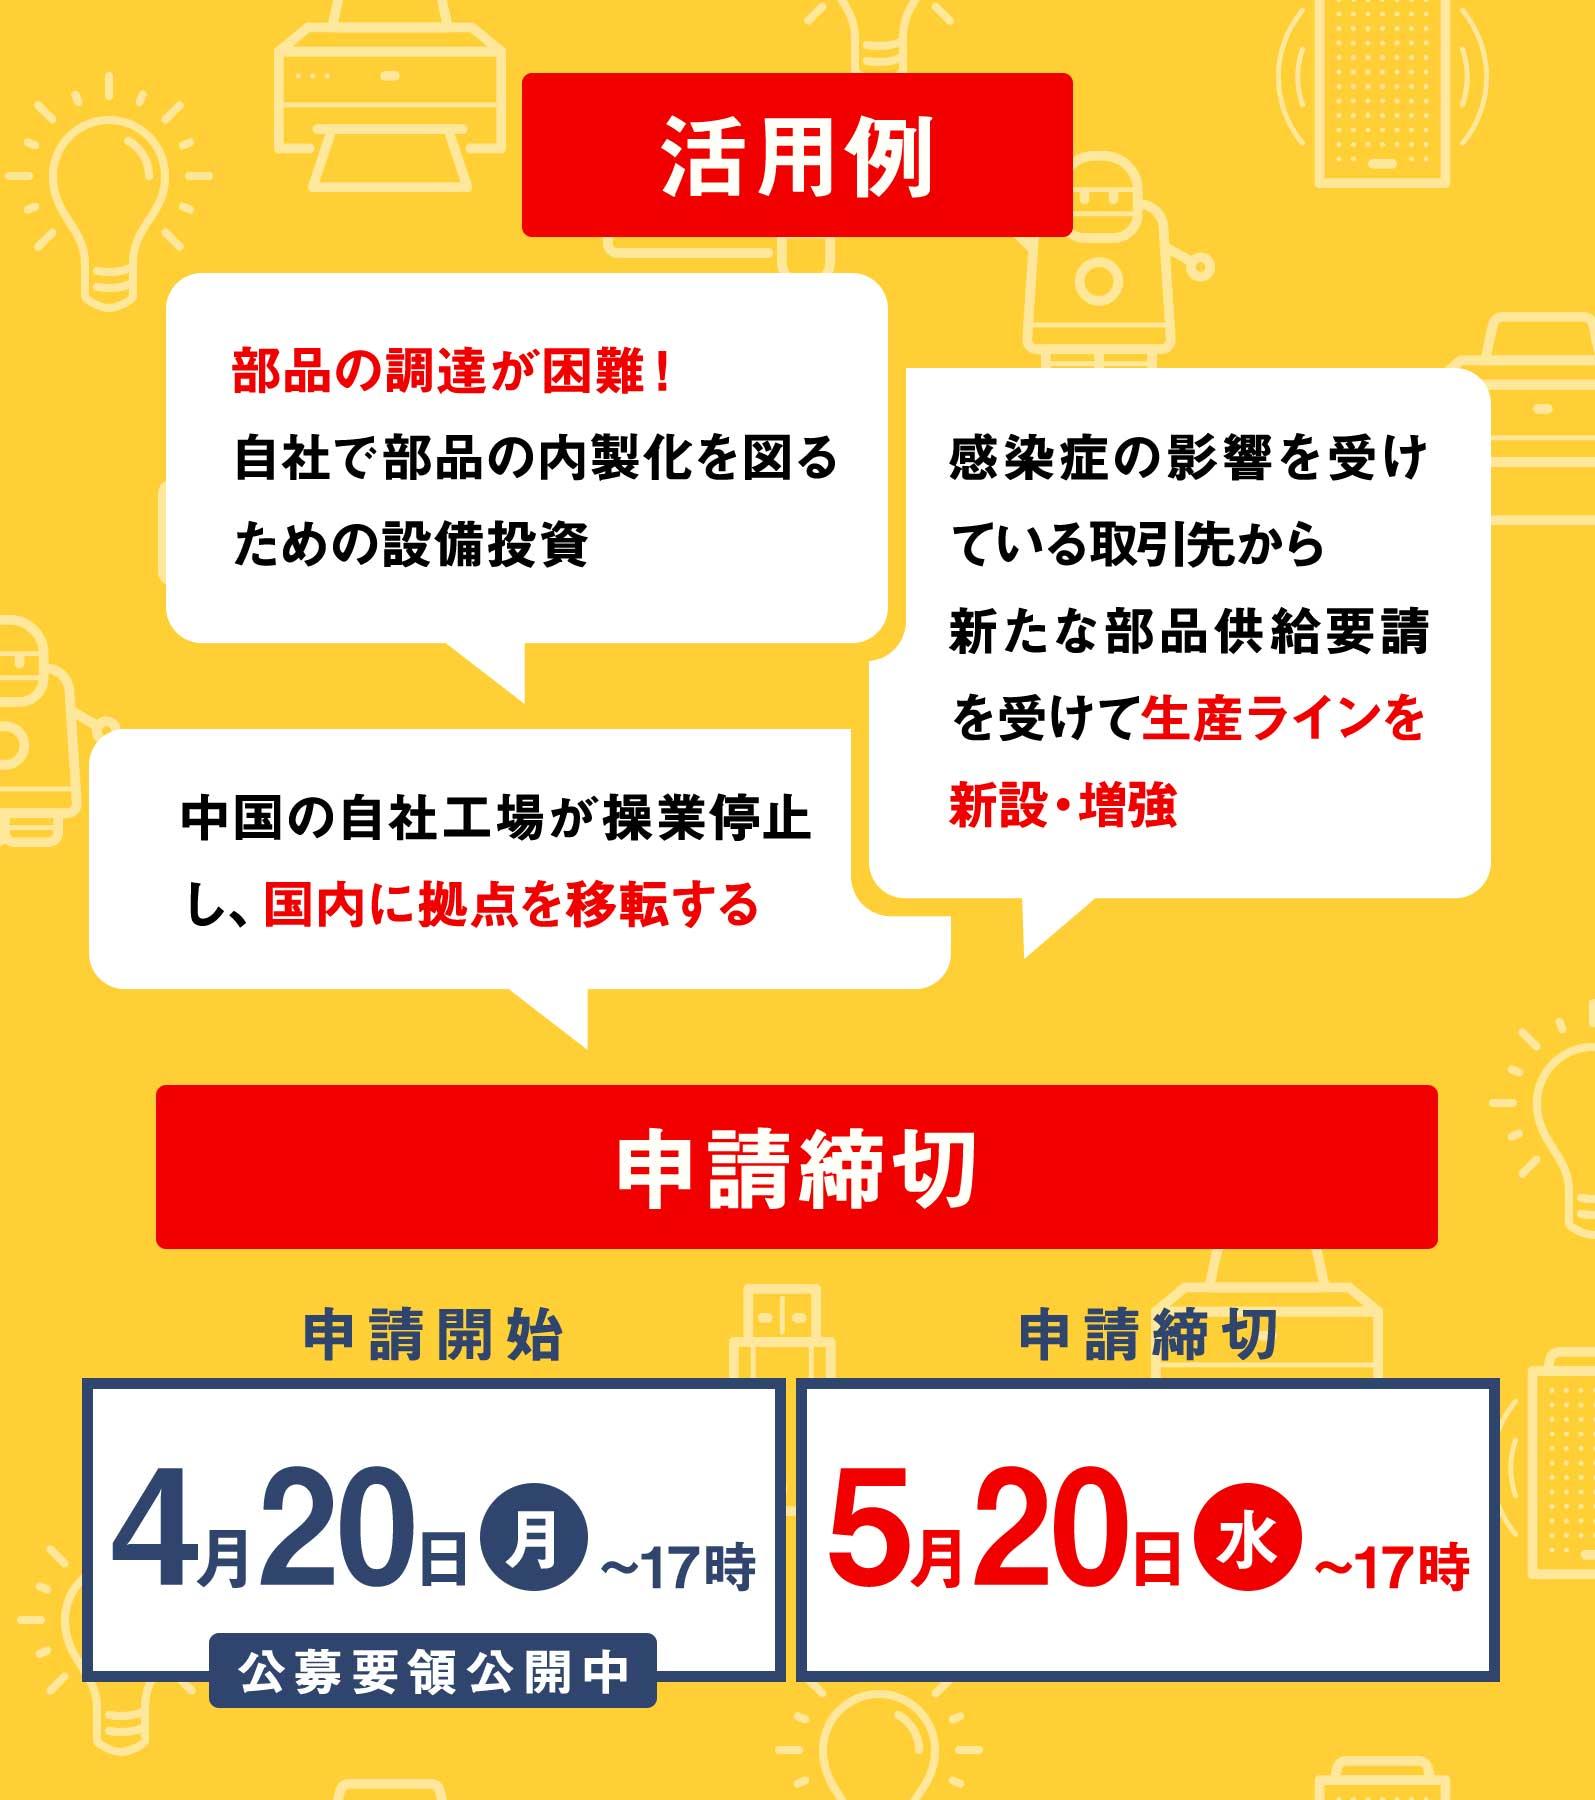 f9fde6e724de4a296d950ee0f1a27da1 - 【中小企業・小規模事業者向け】新製品・サービス開発のためのお金を補助します。